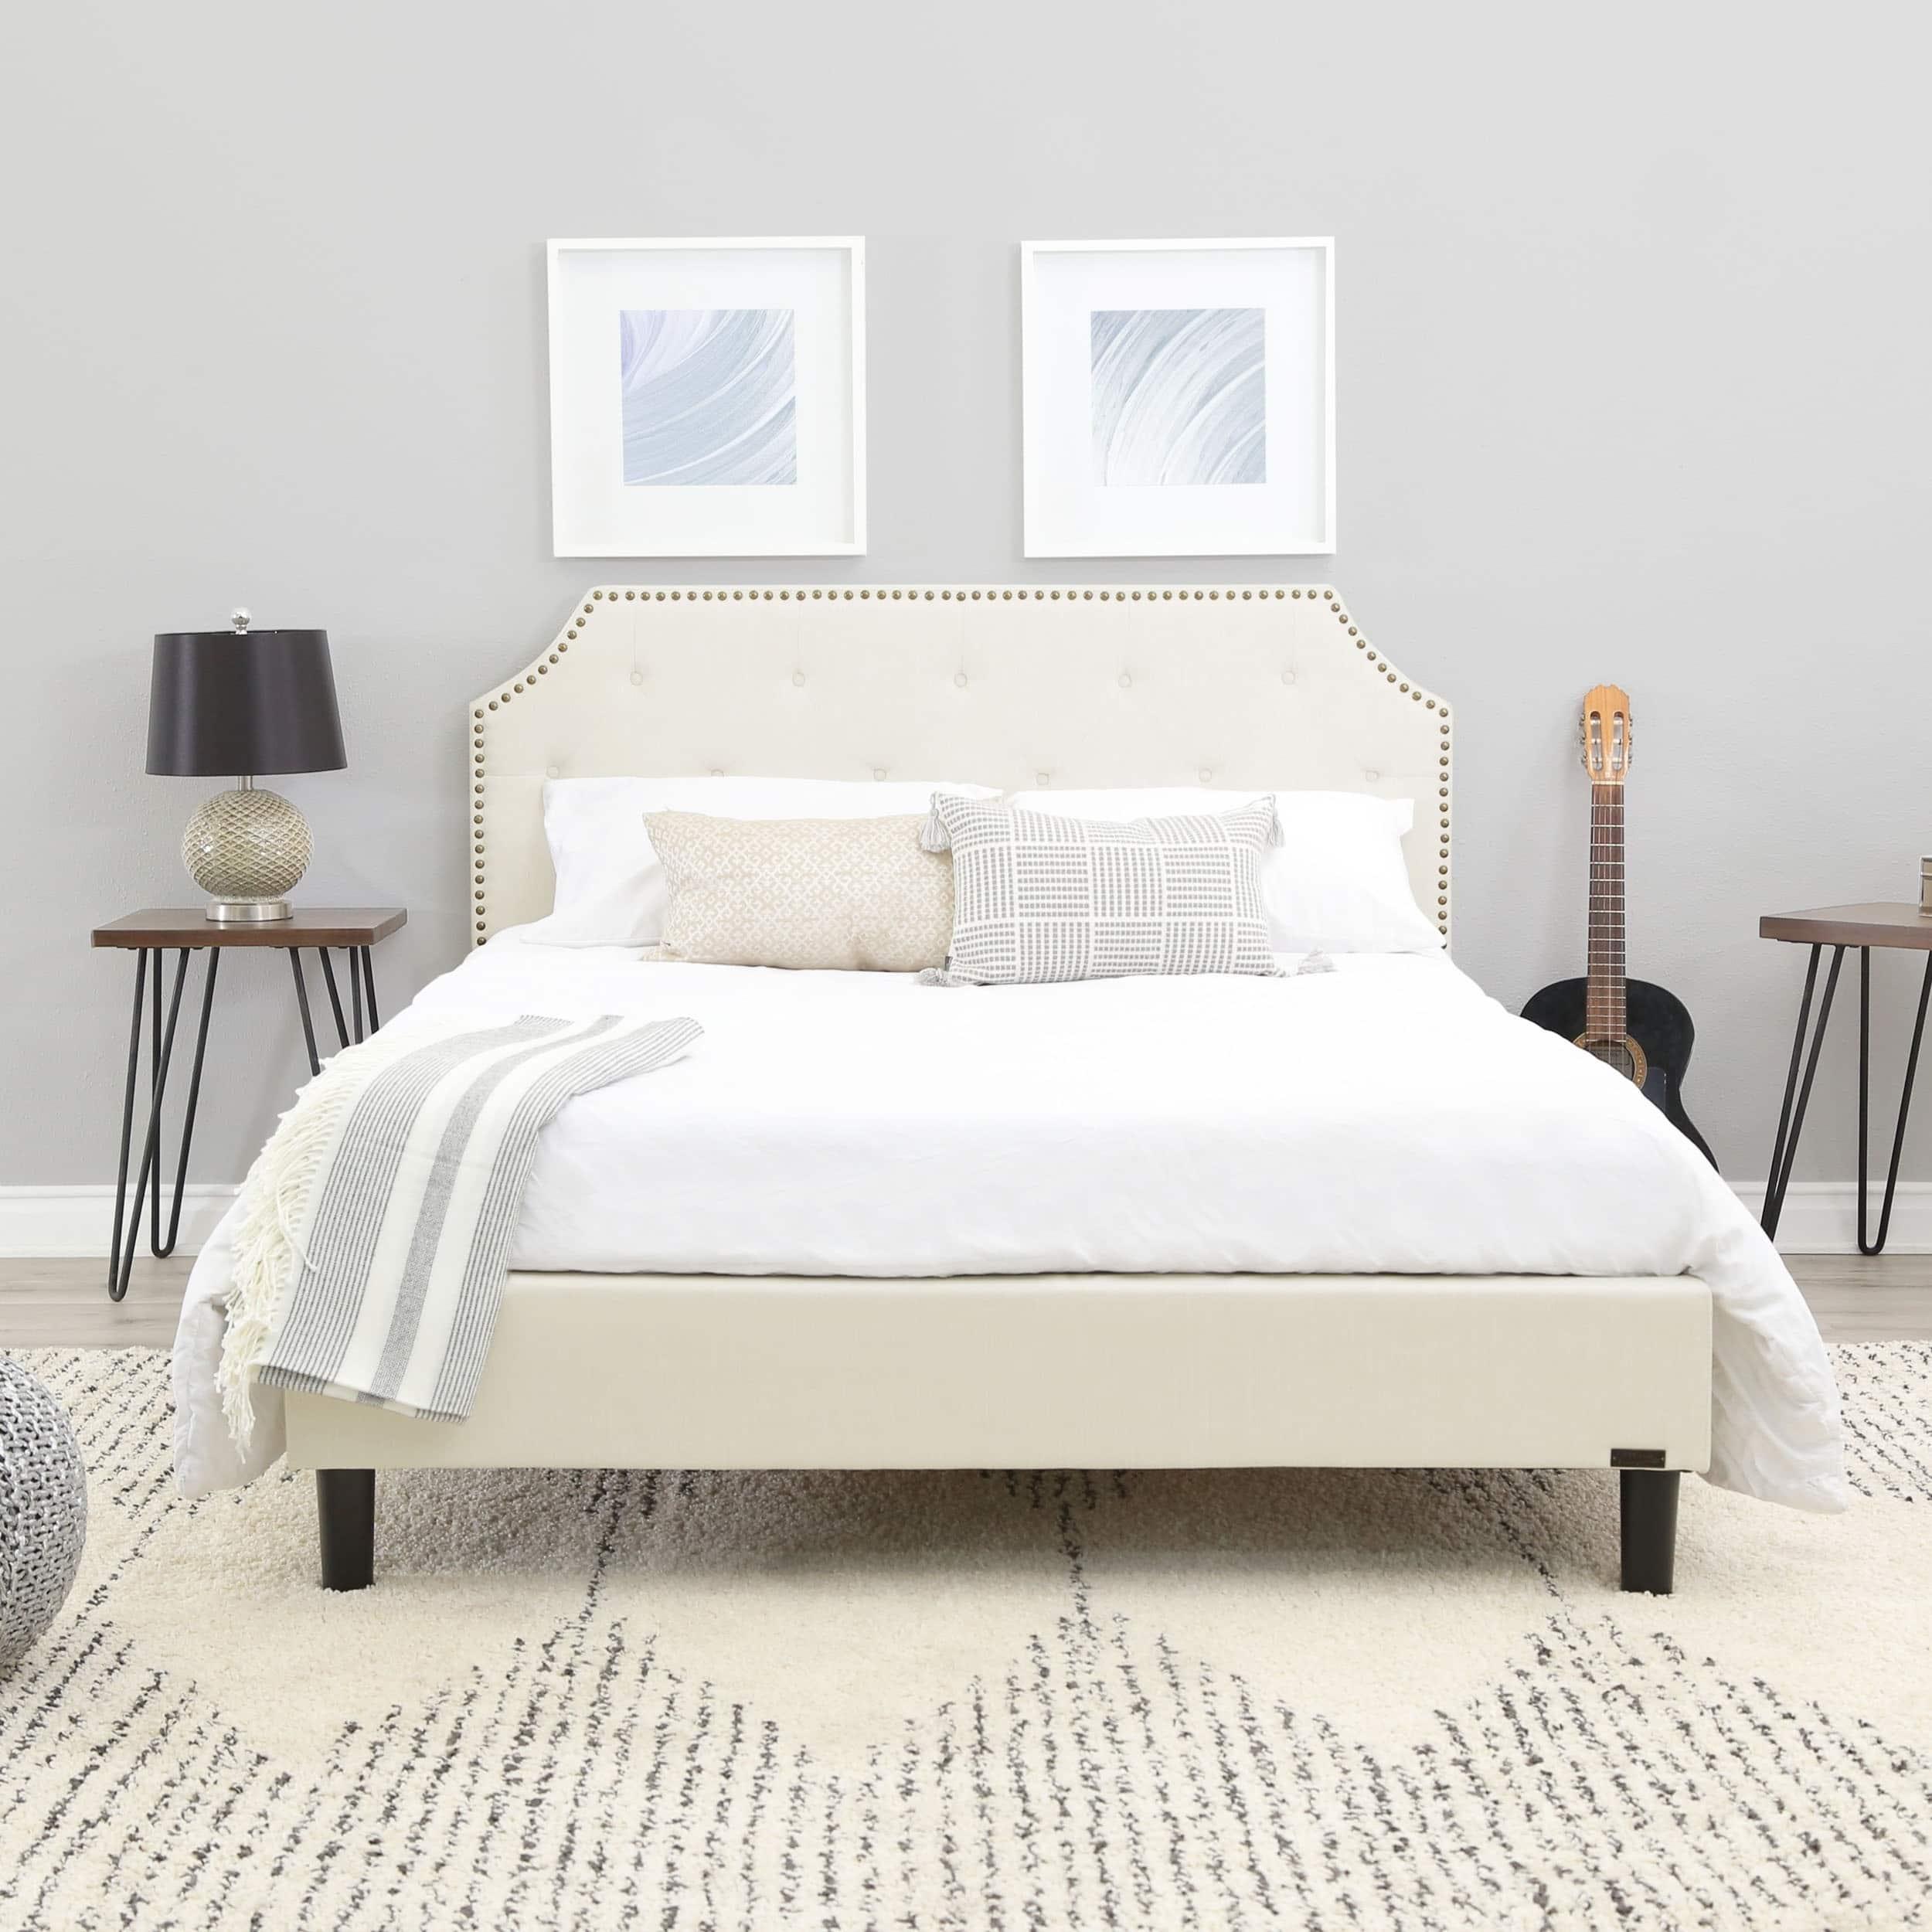 Great Deals On Furniture Online: Buy Beds Online At Overstock